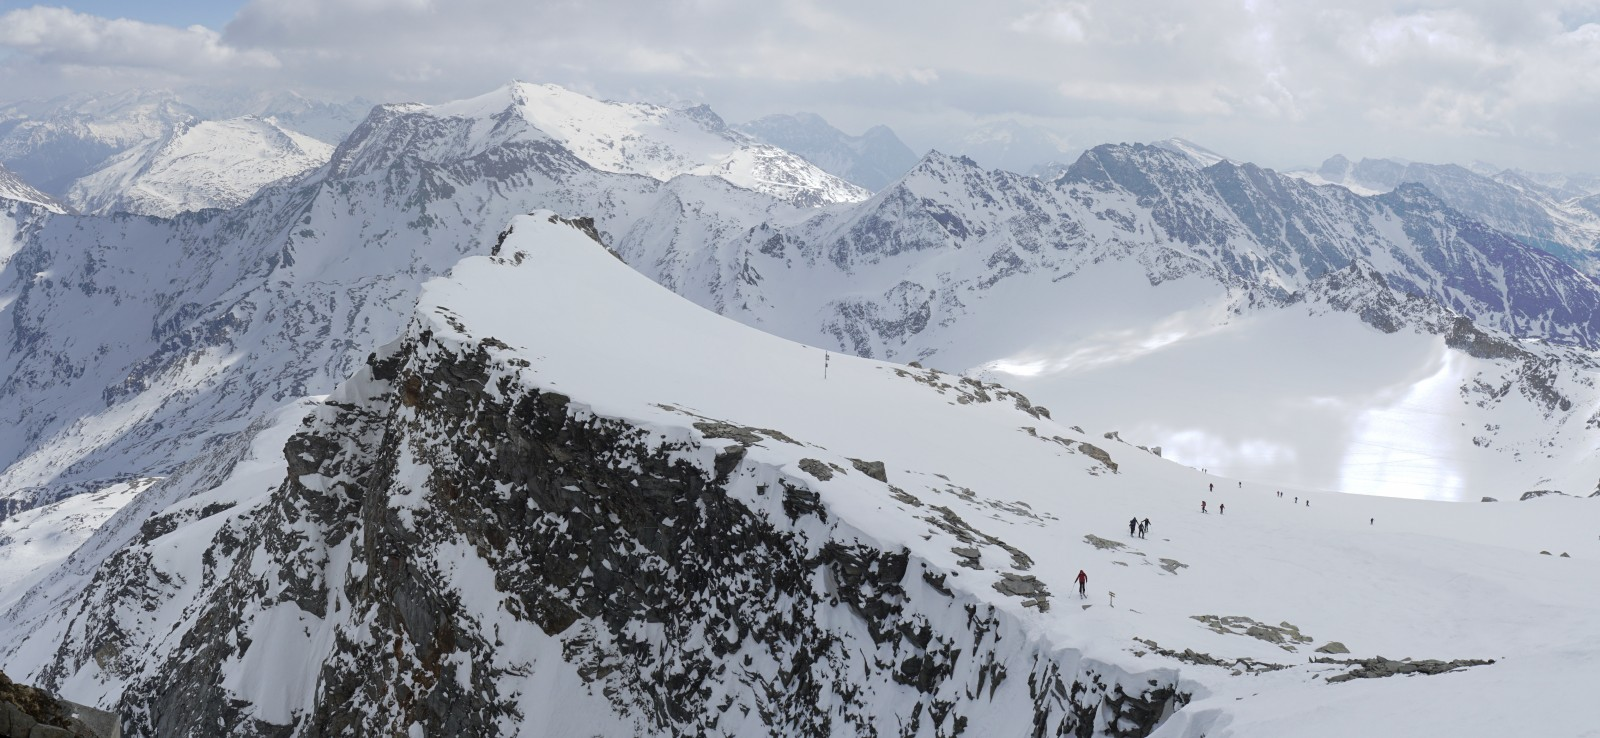 Výhled z Hoher Sonnblick